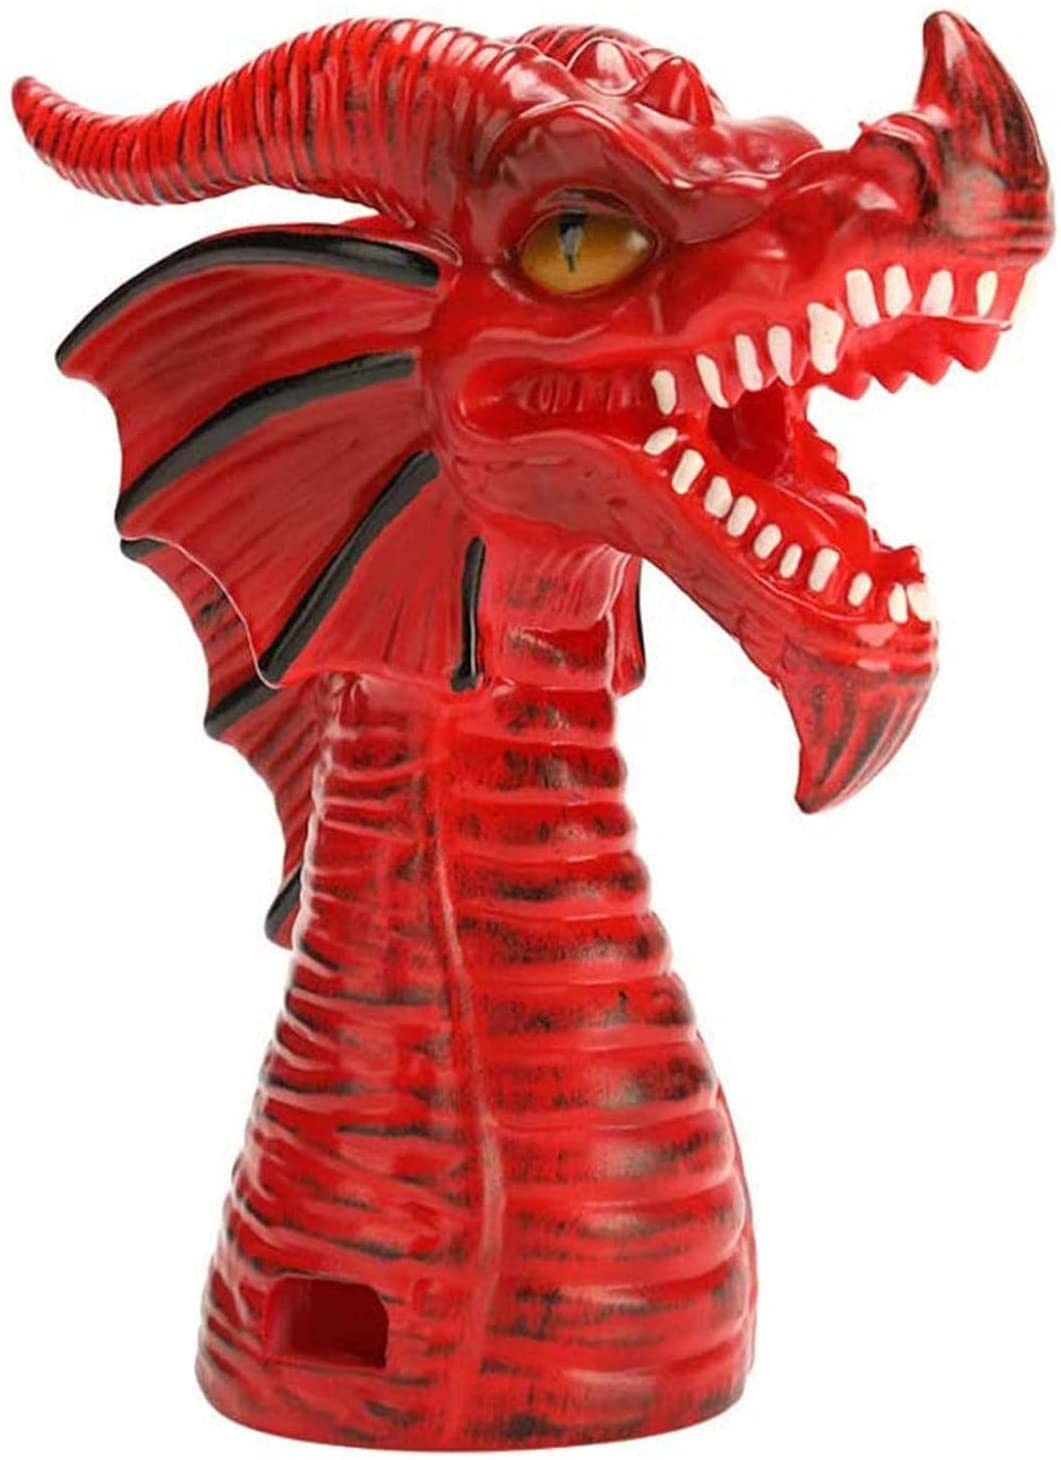 Fire-Breathing Dragon Original Steam Release Accessory, Steam Release Diverter for Pot Pressure Cooker Kitchen Supplies (Black)